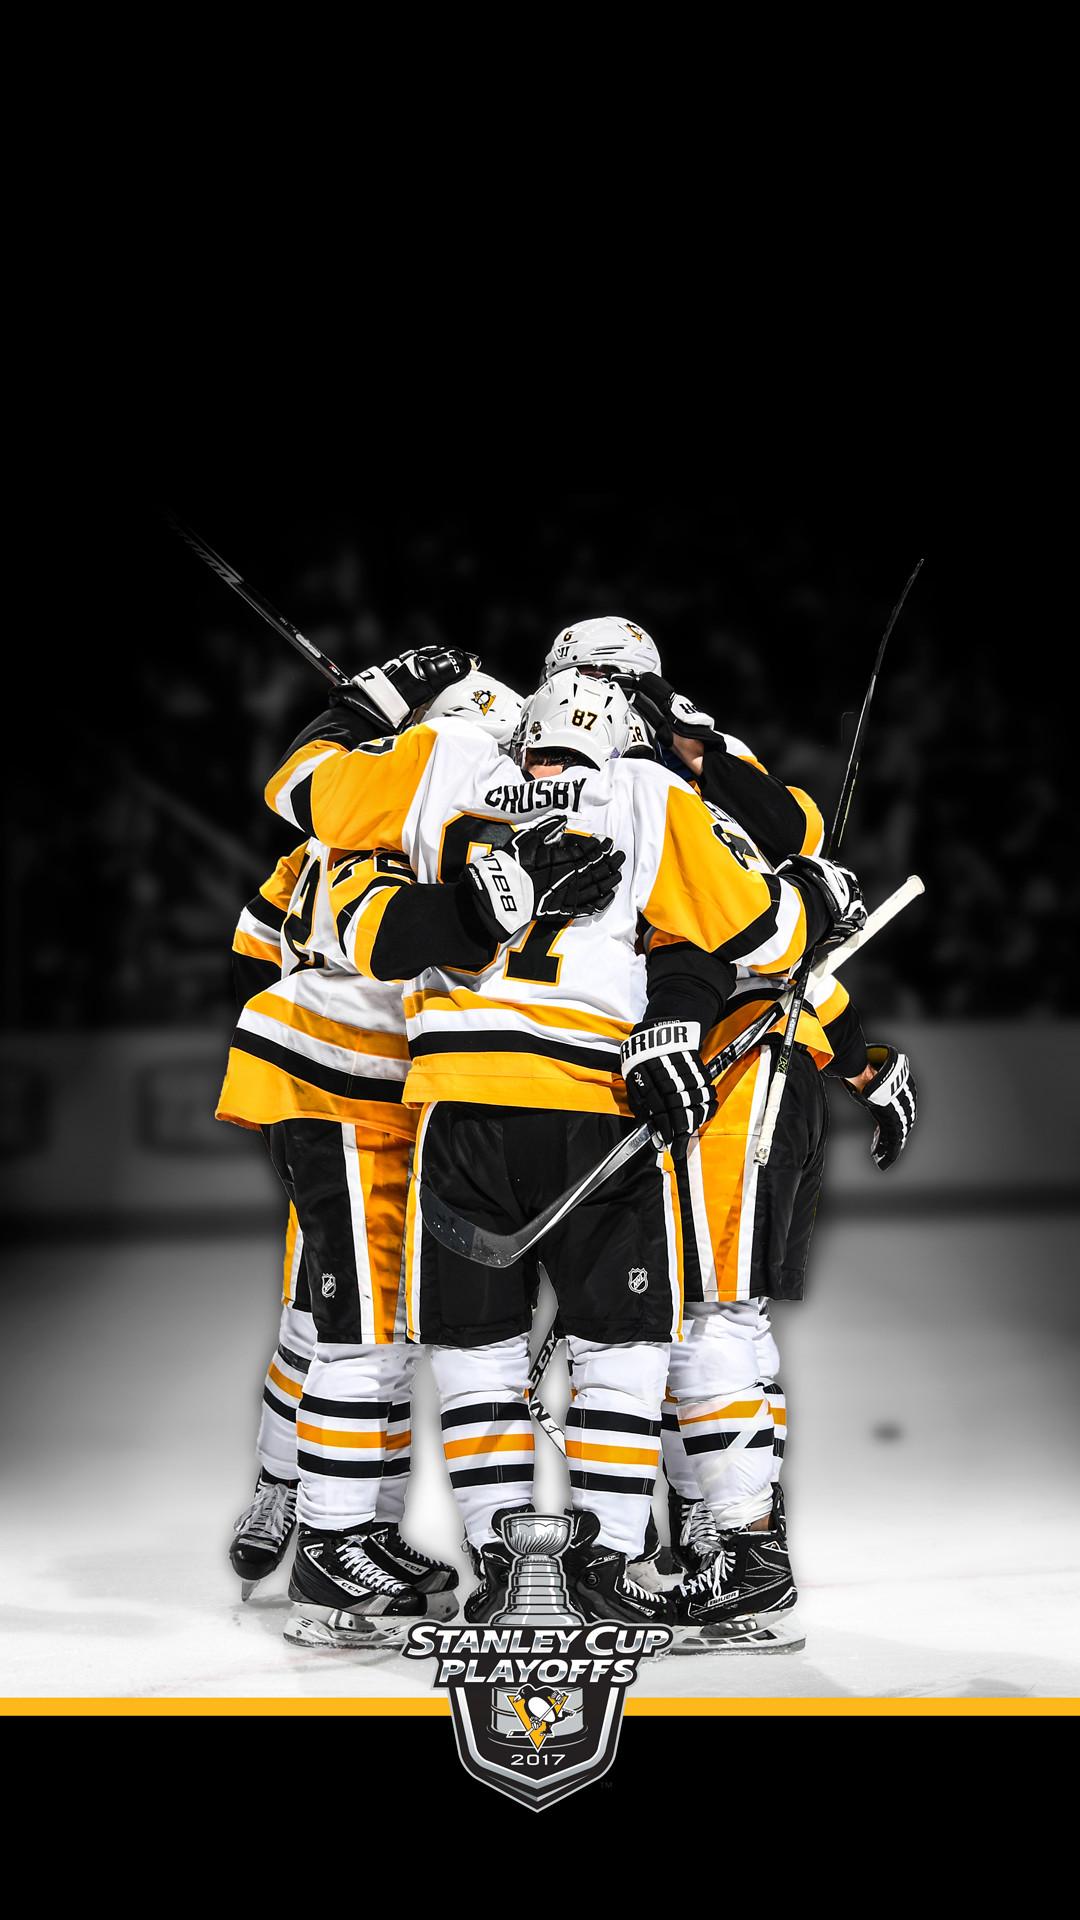 Pittsburgh Penguins Wallpaper HD (80+ images)